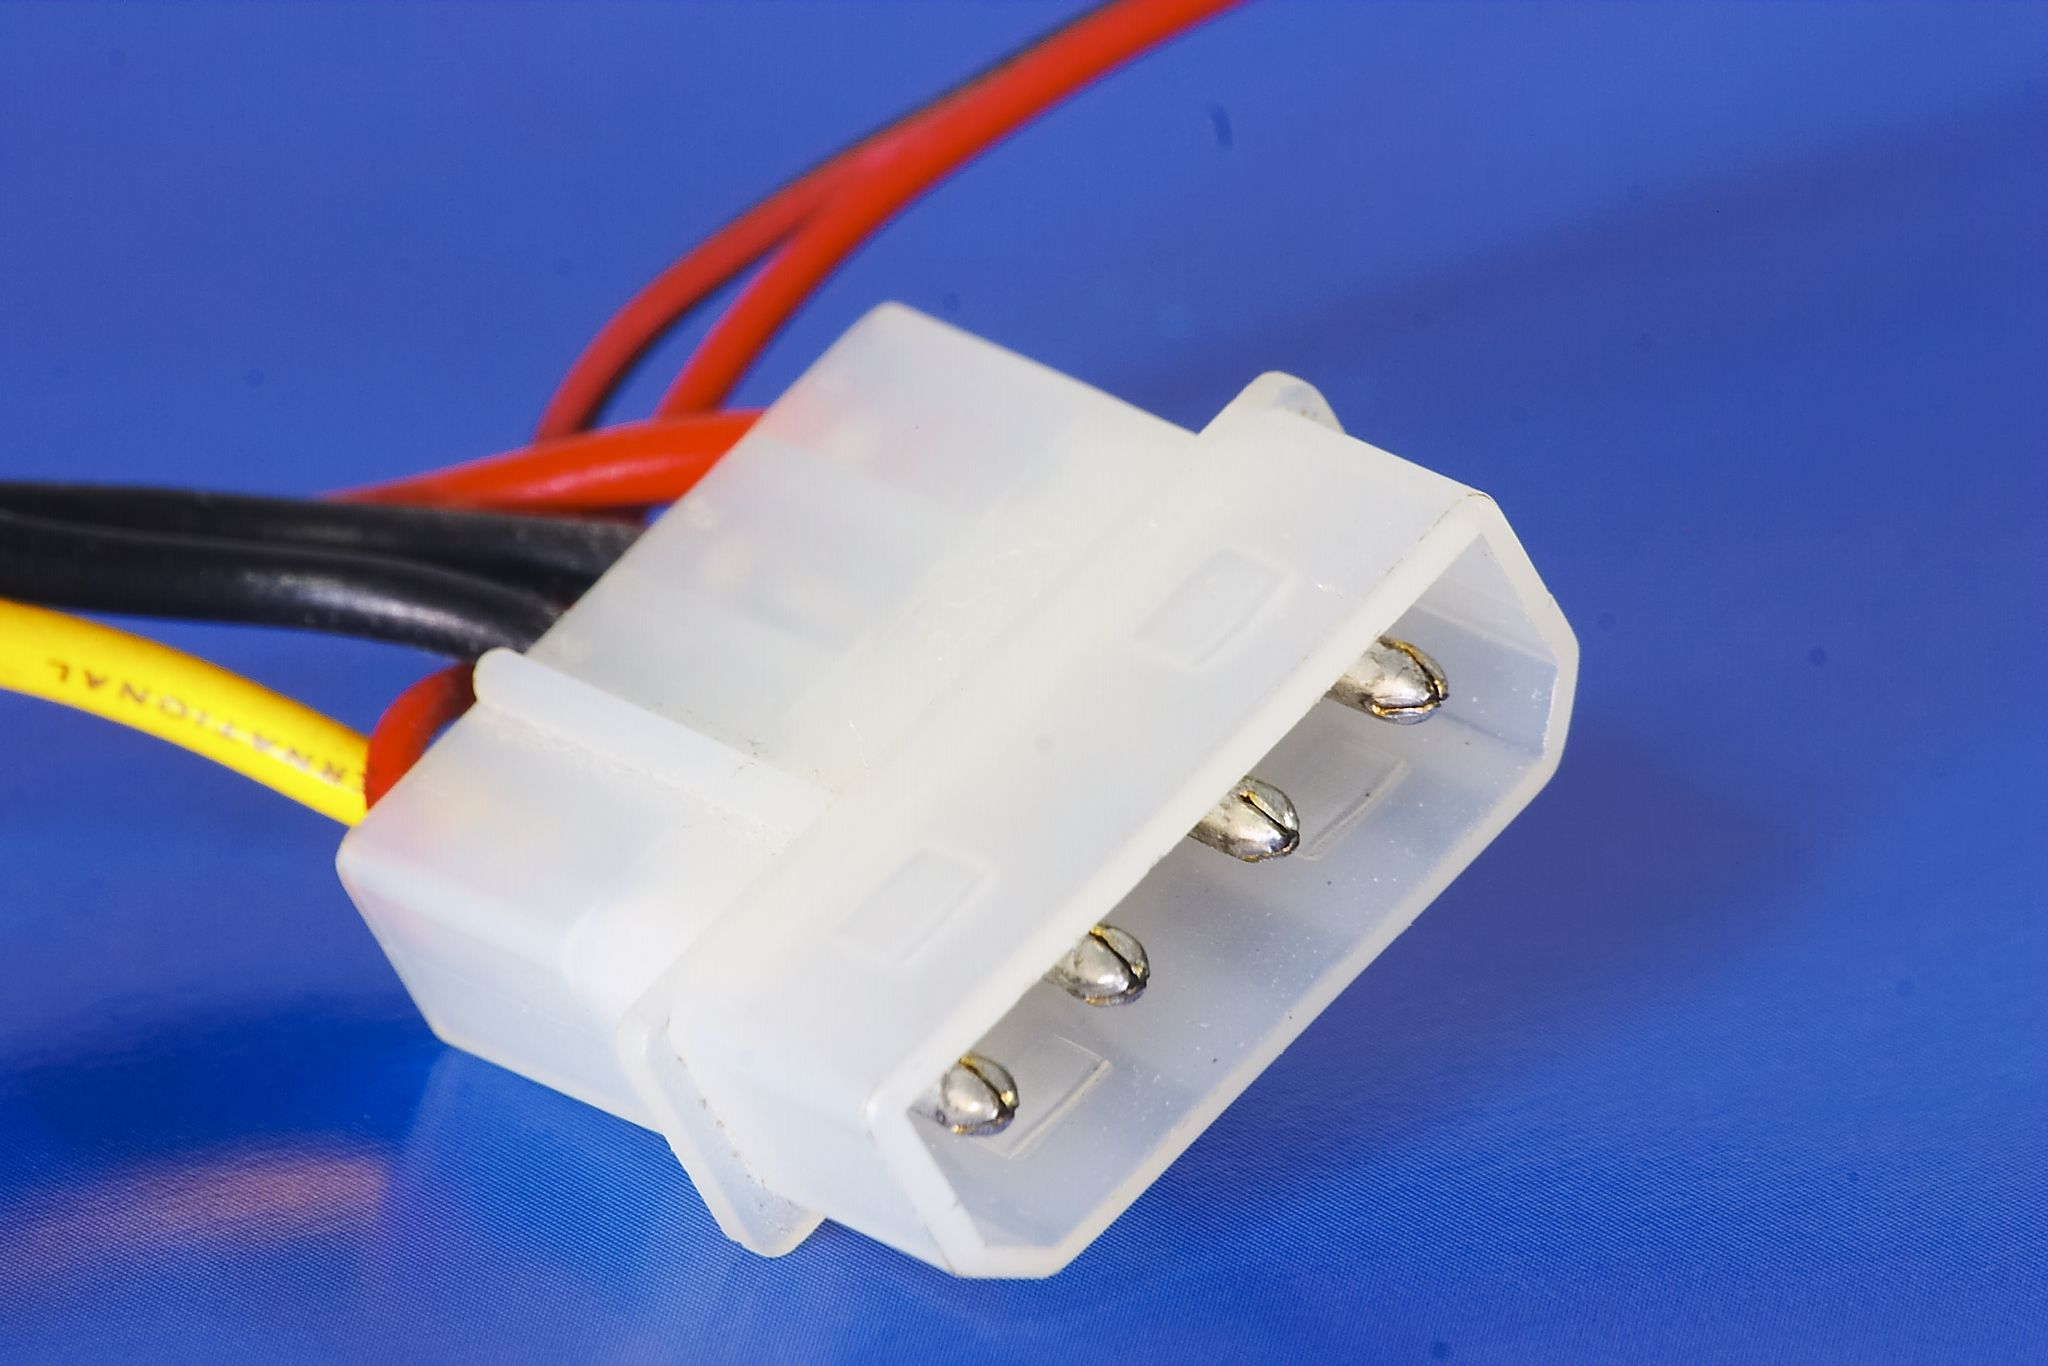 4 Pin Peripheral Power Connector Pinout Atx Psu Wiring Diagram